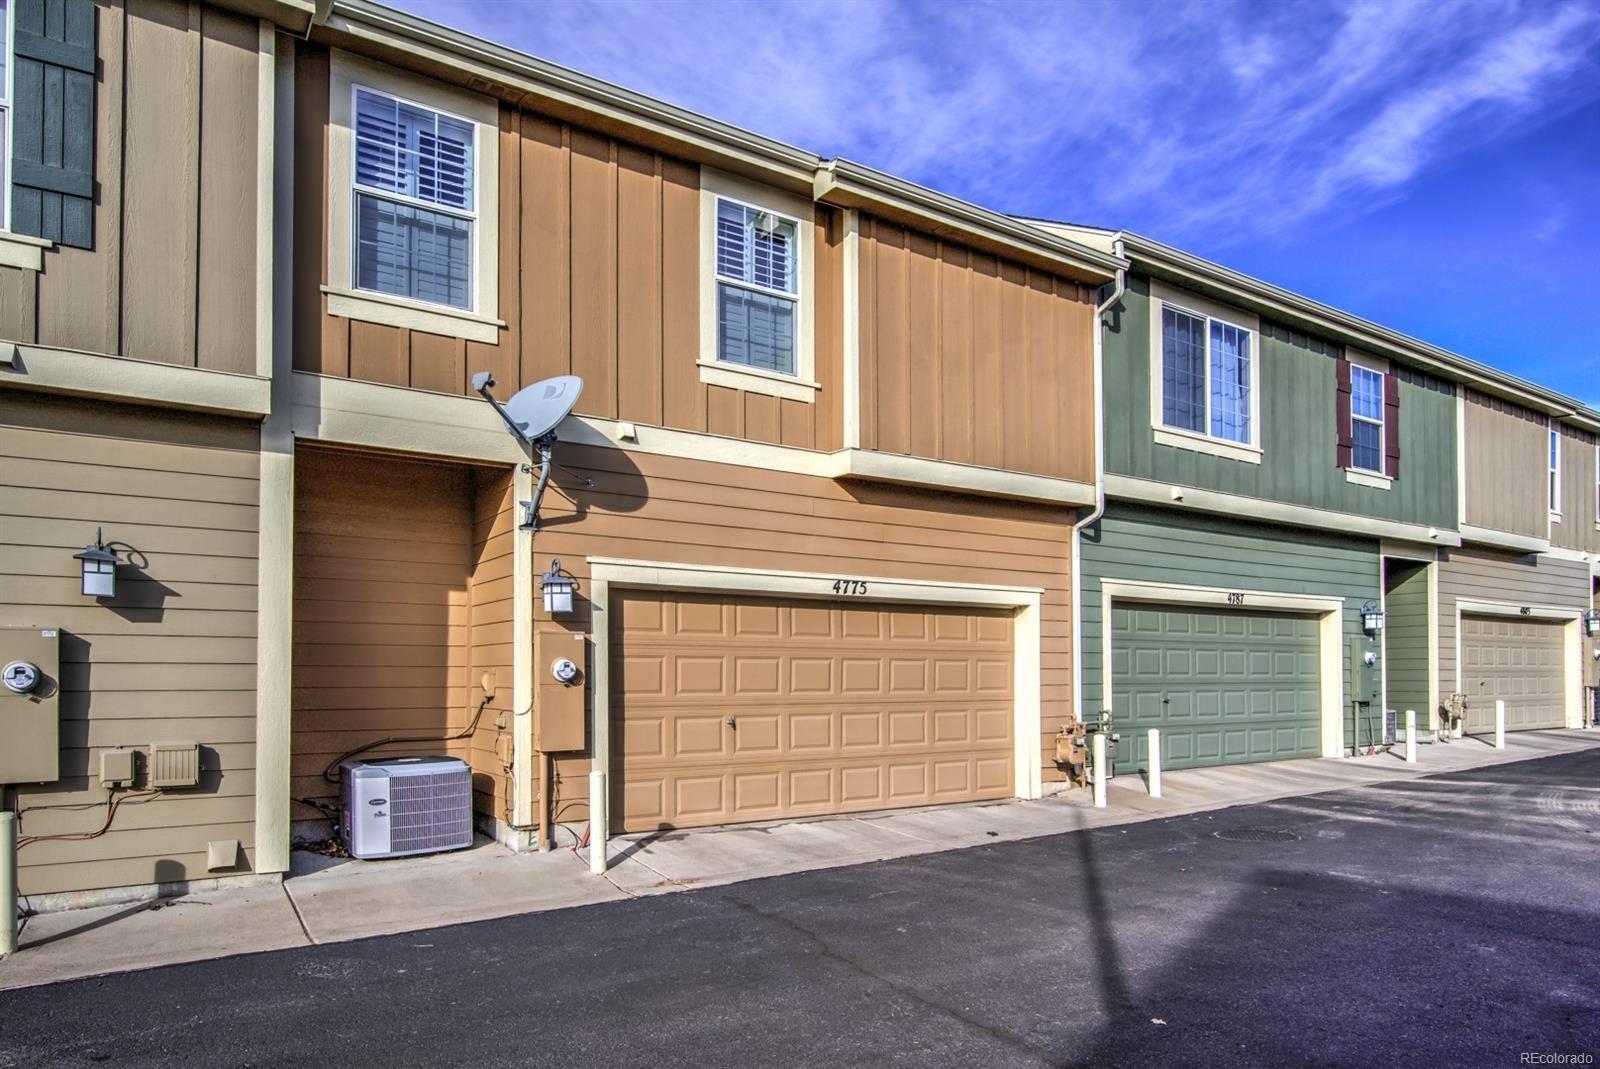 MLS# 7570931 - 29 - 4775 Stony Mesa Court, Castle Rock, CO 80108